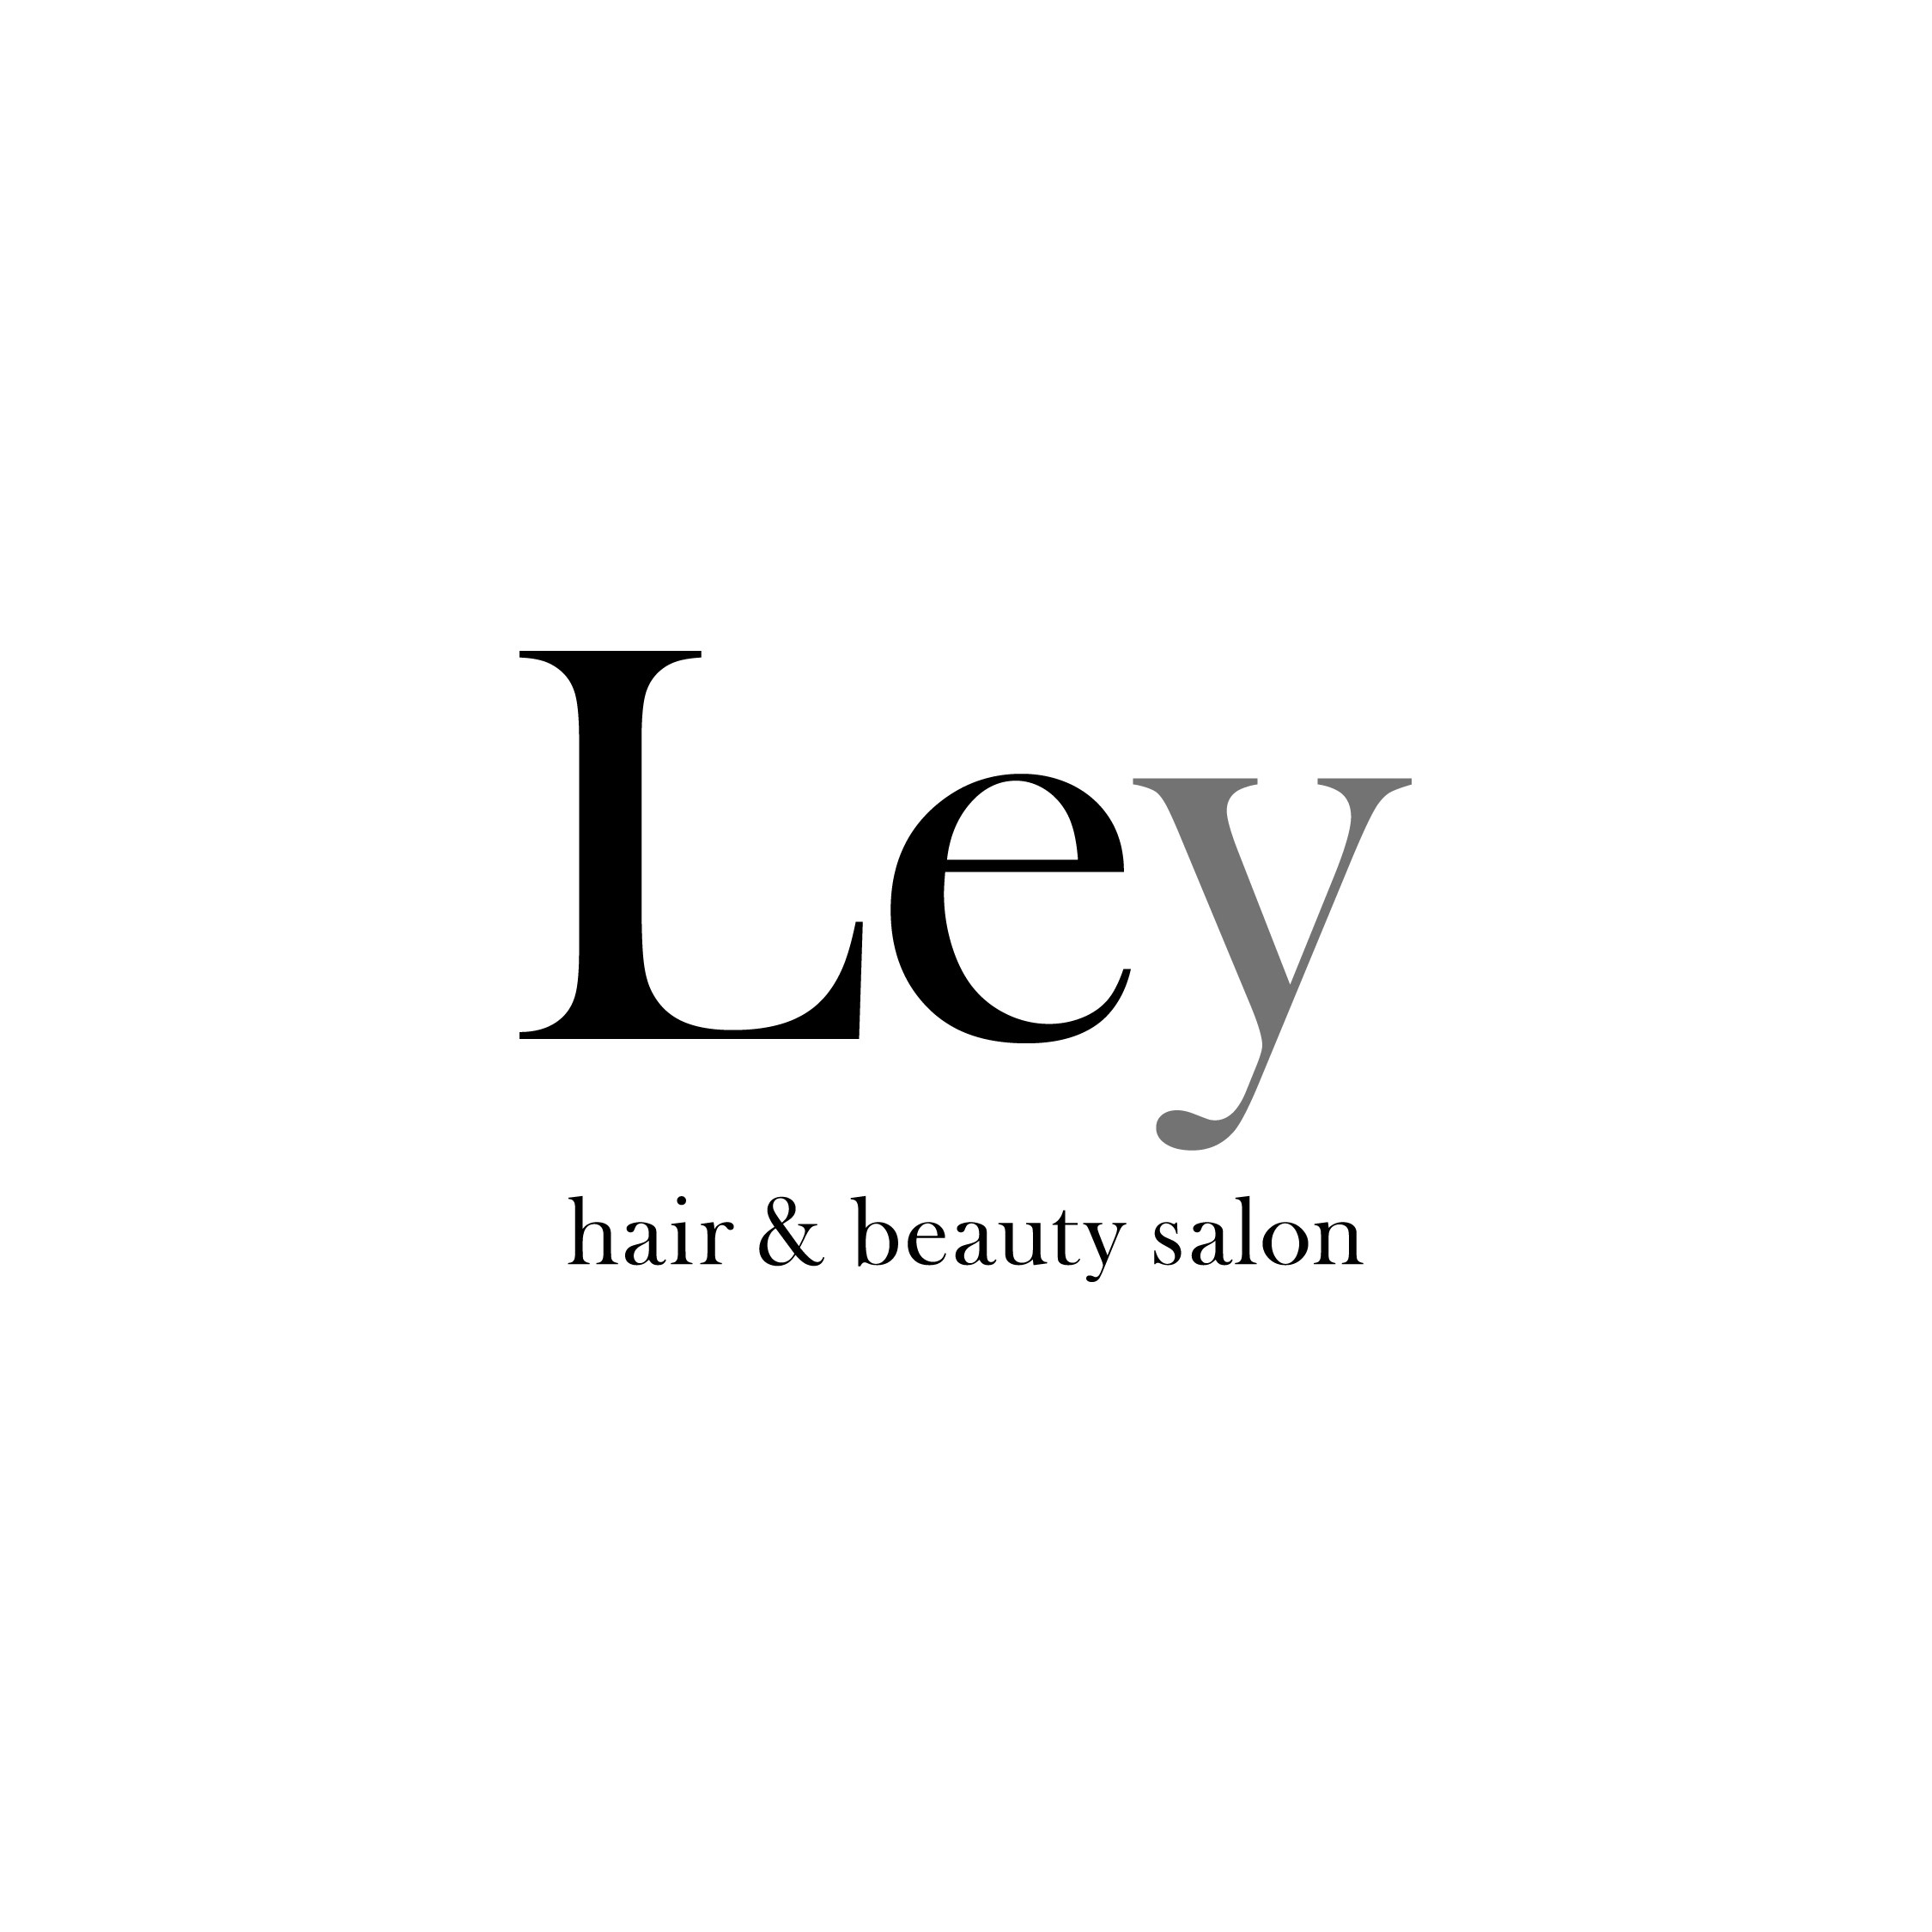 Hair and beauty salon Ley|CIロゴデザイン グラフィックデザイン ブランドデザイン|美容室・ヘアサロン|神奈川県横浜市